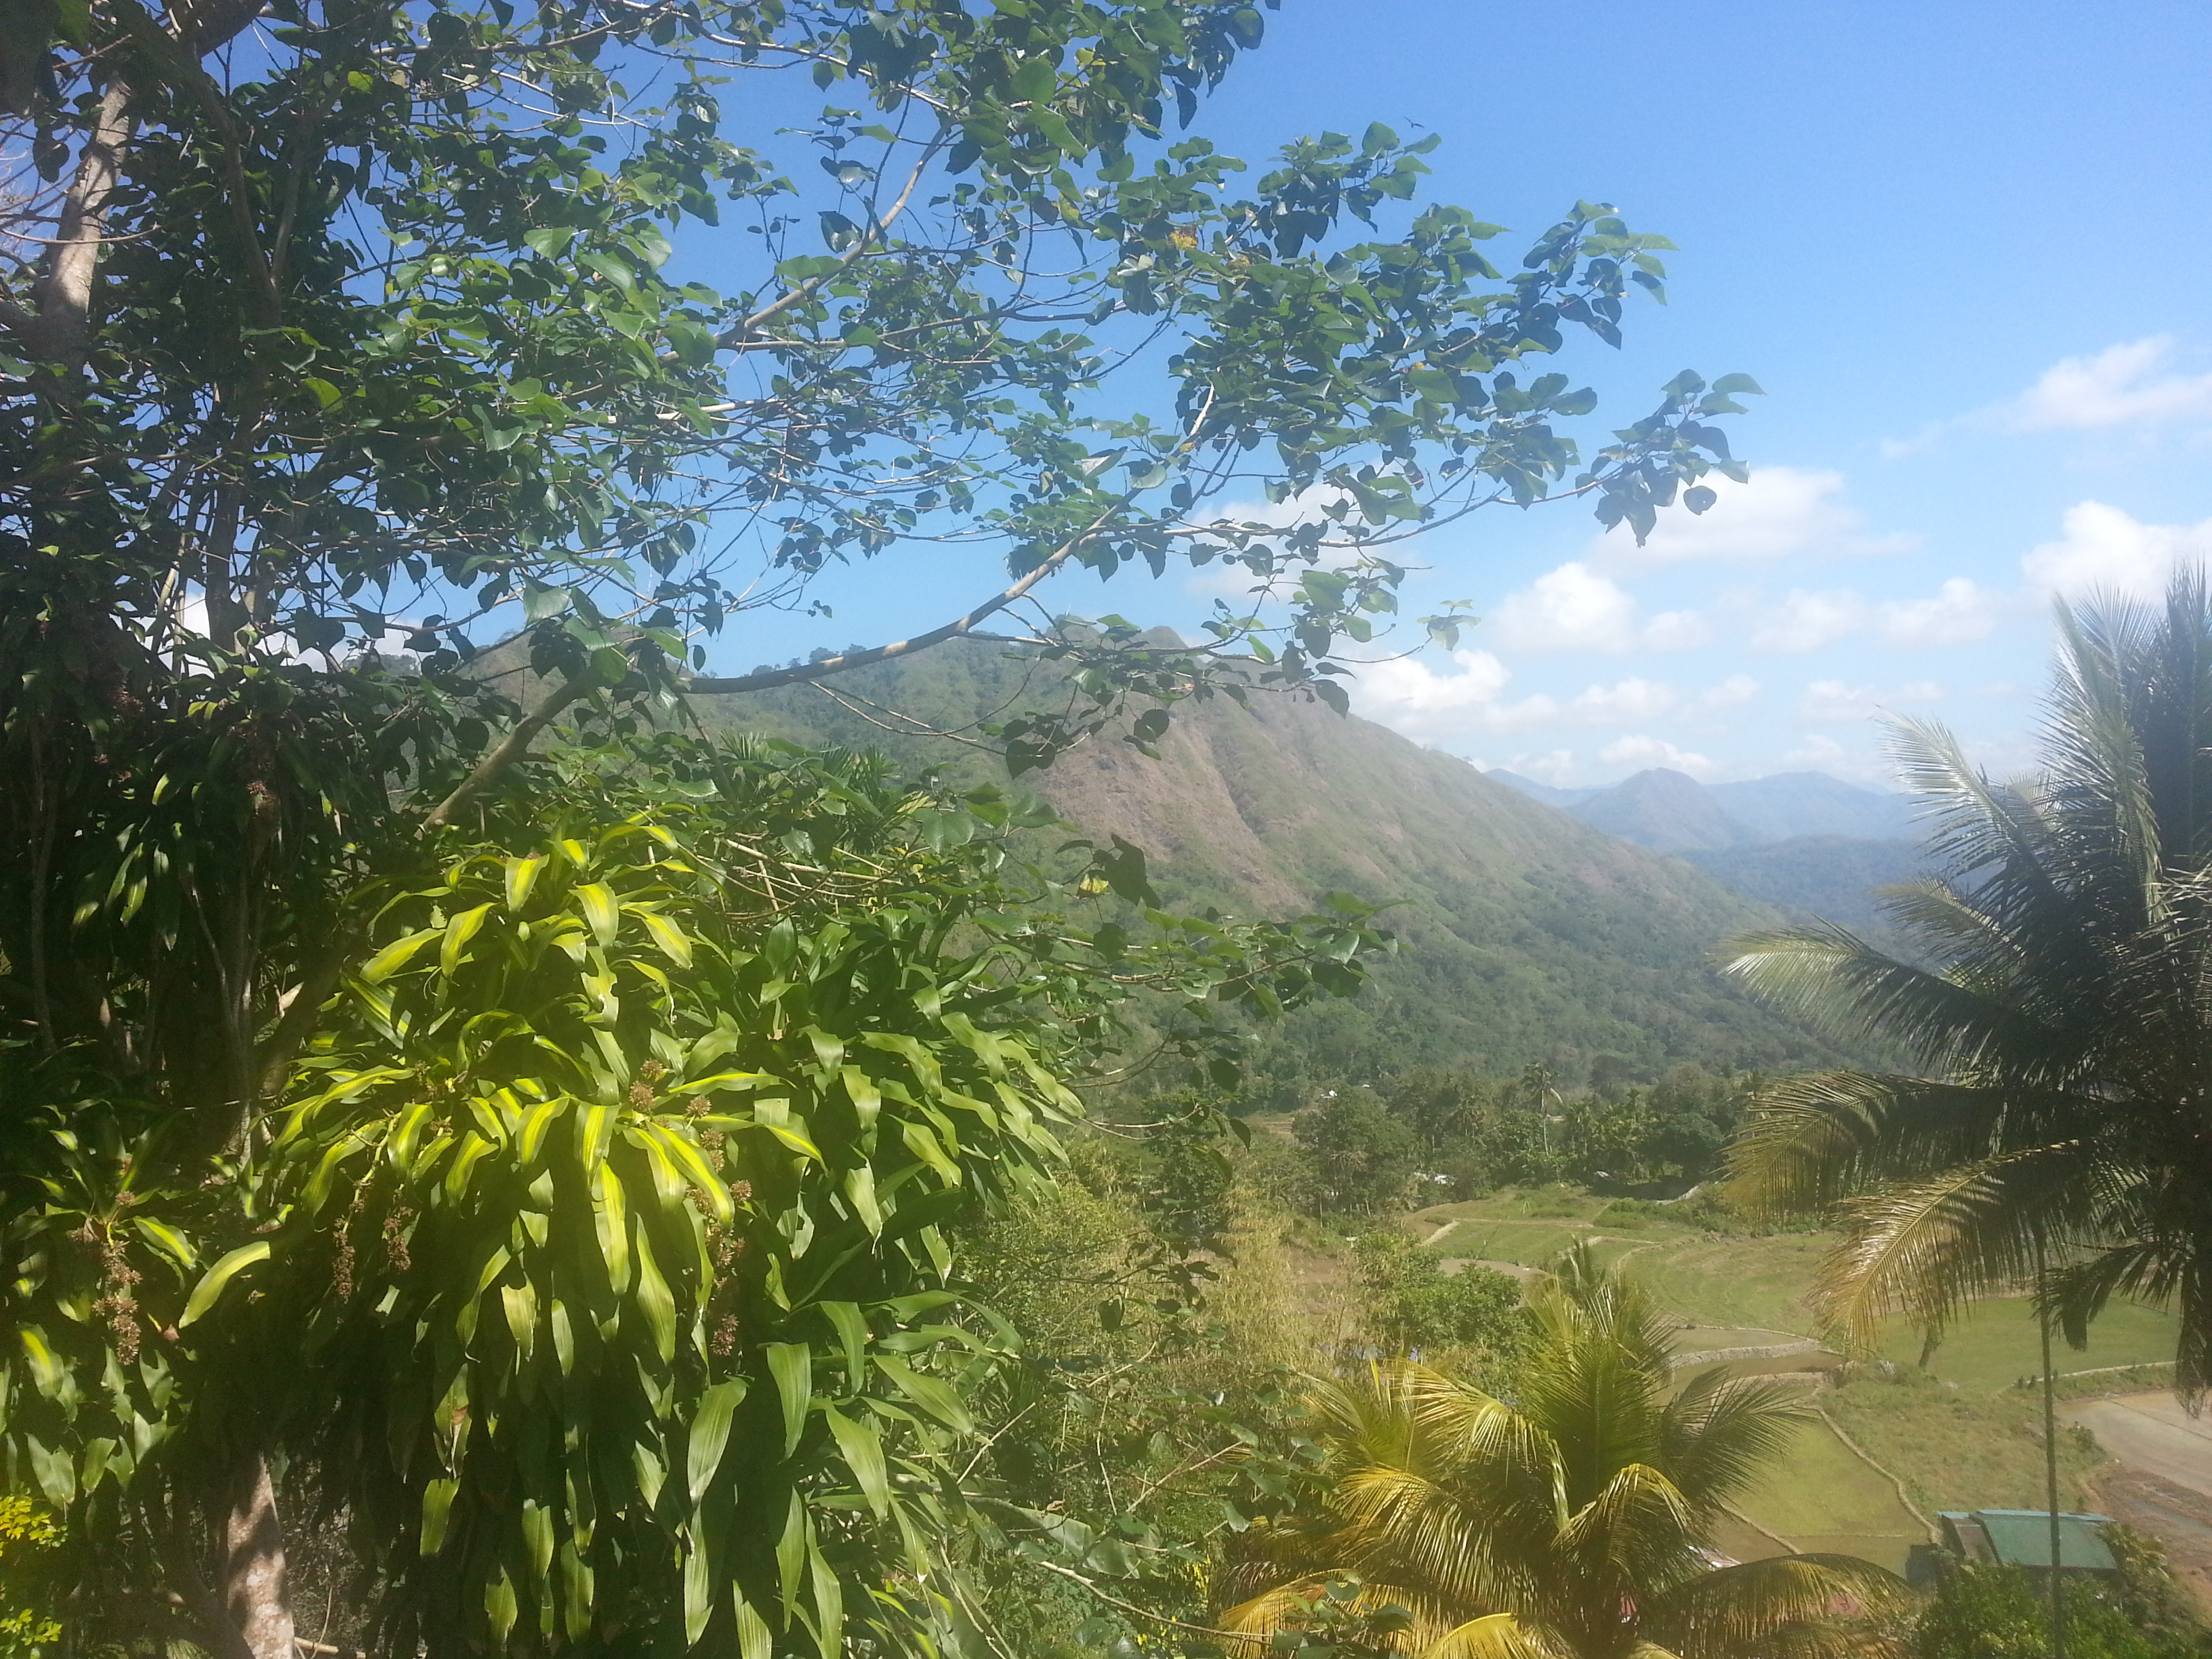 Cordillera mountain range, view from Ifuguao.